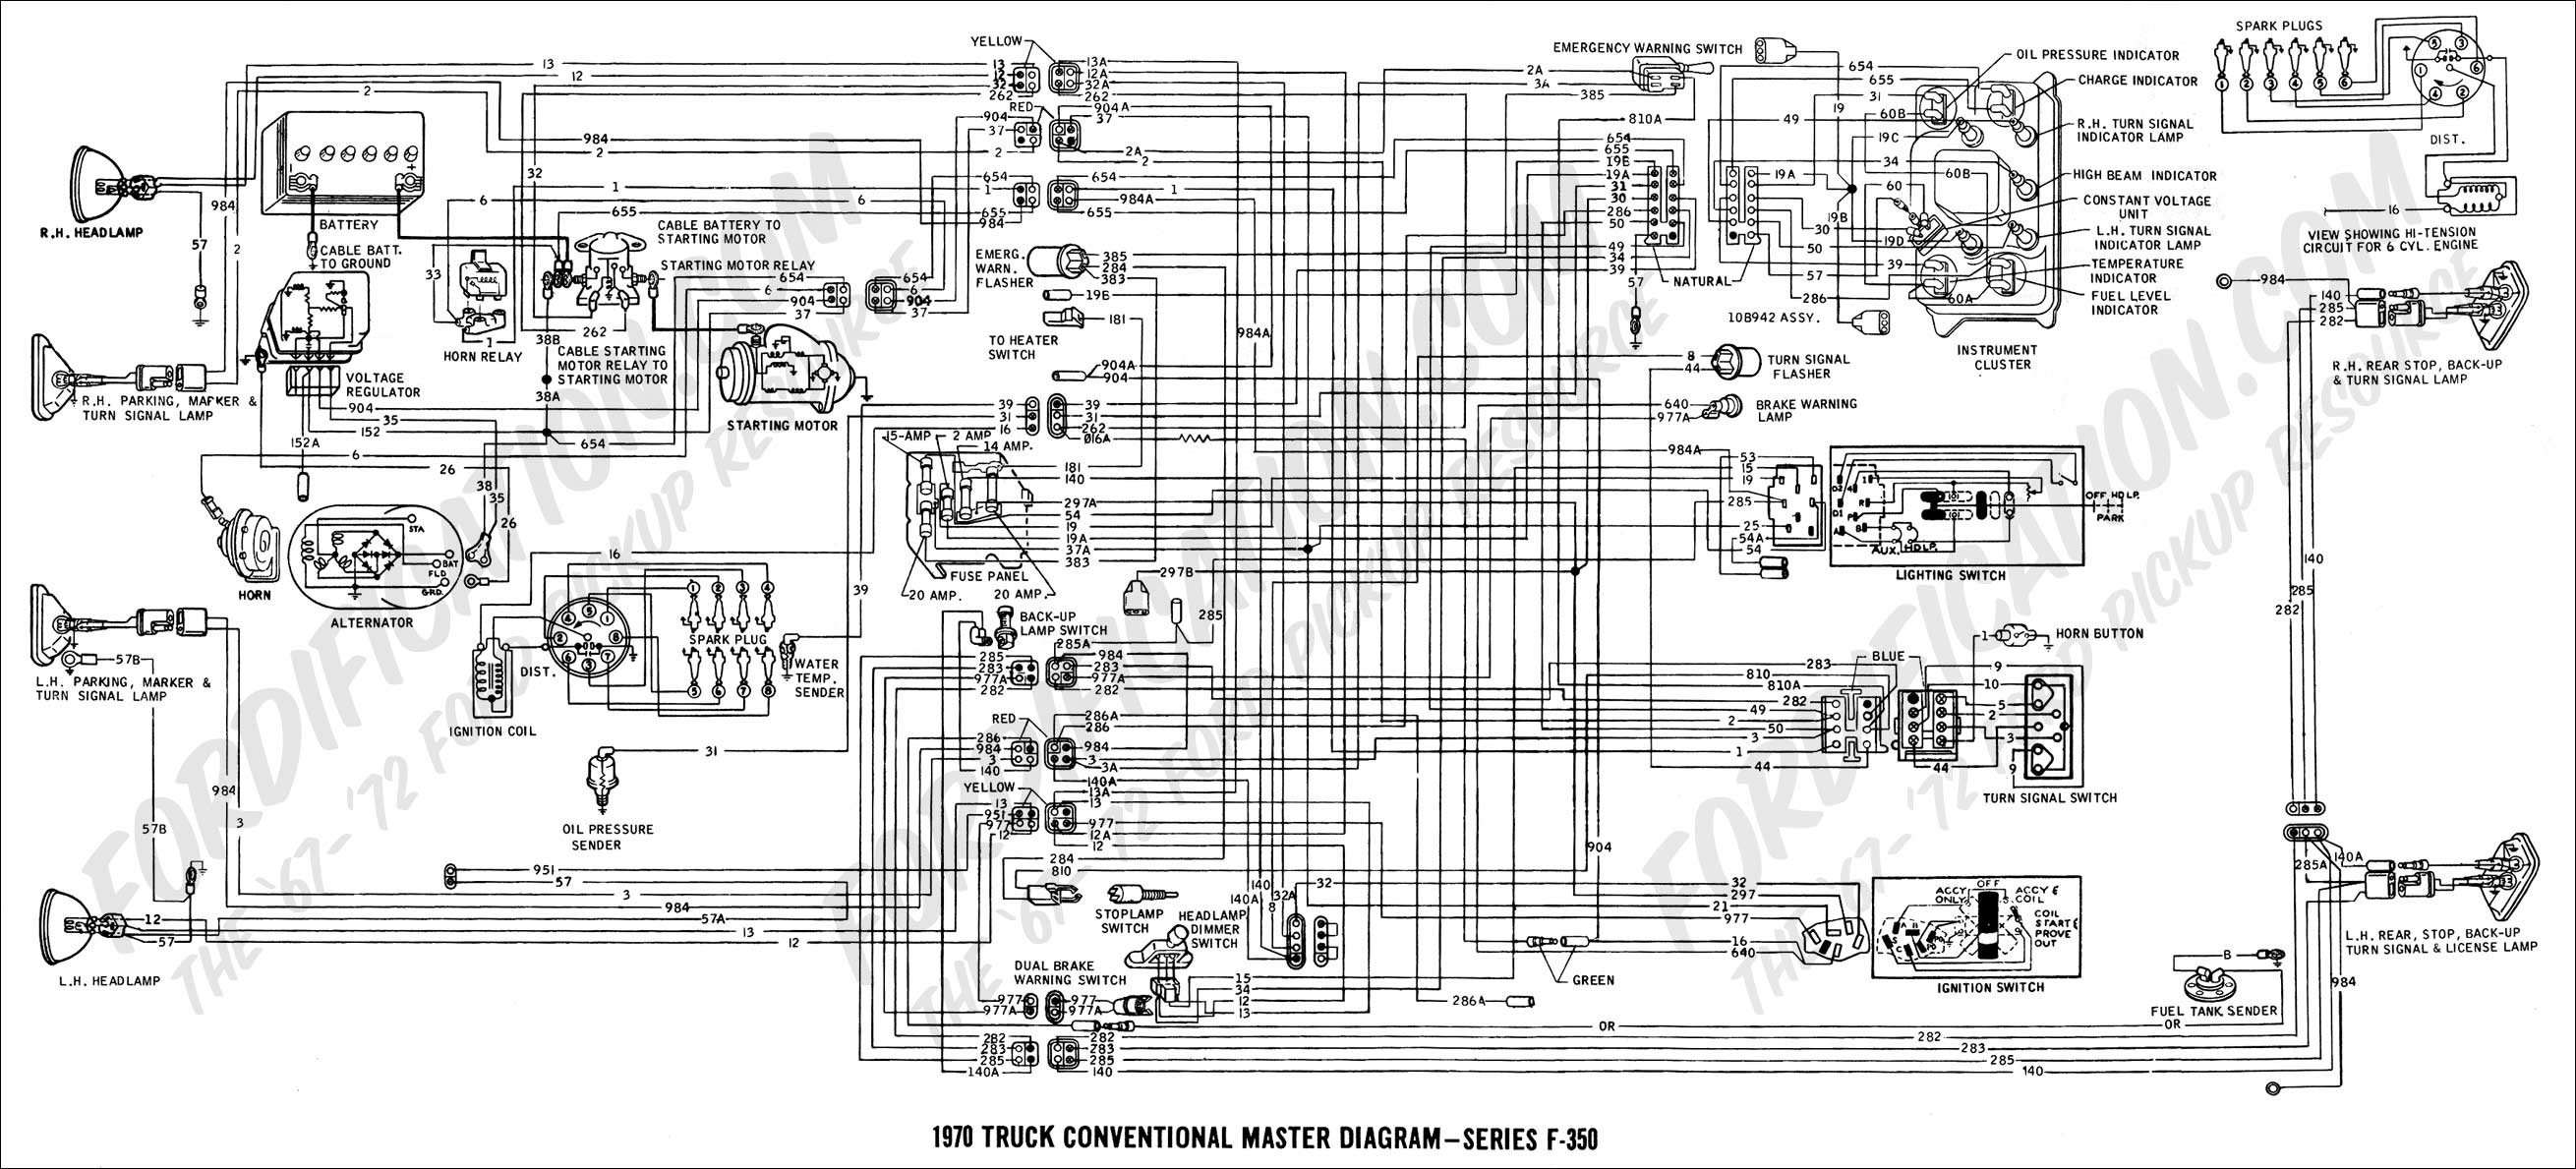 7 3 L Powerstroke Engine Diagram 1997 7 3l Engine Diagram Experts Wiring Diagram • Of 7 3 L Powerstroke Engine Diagram